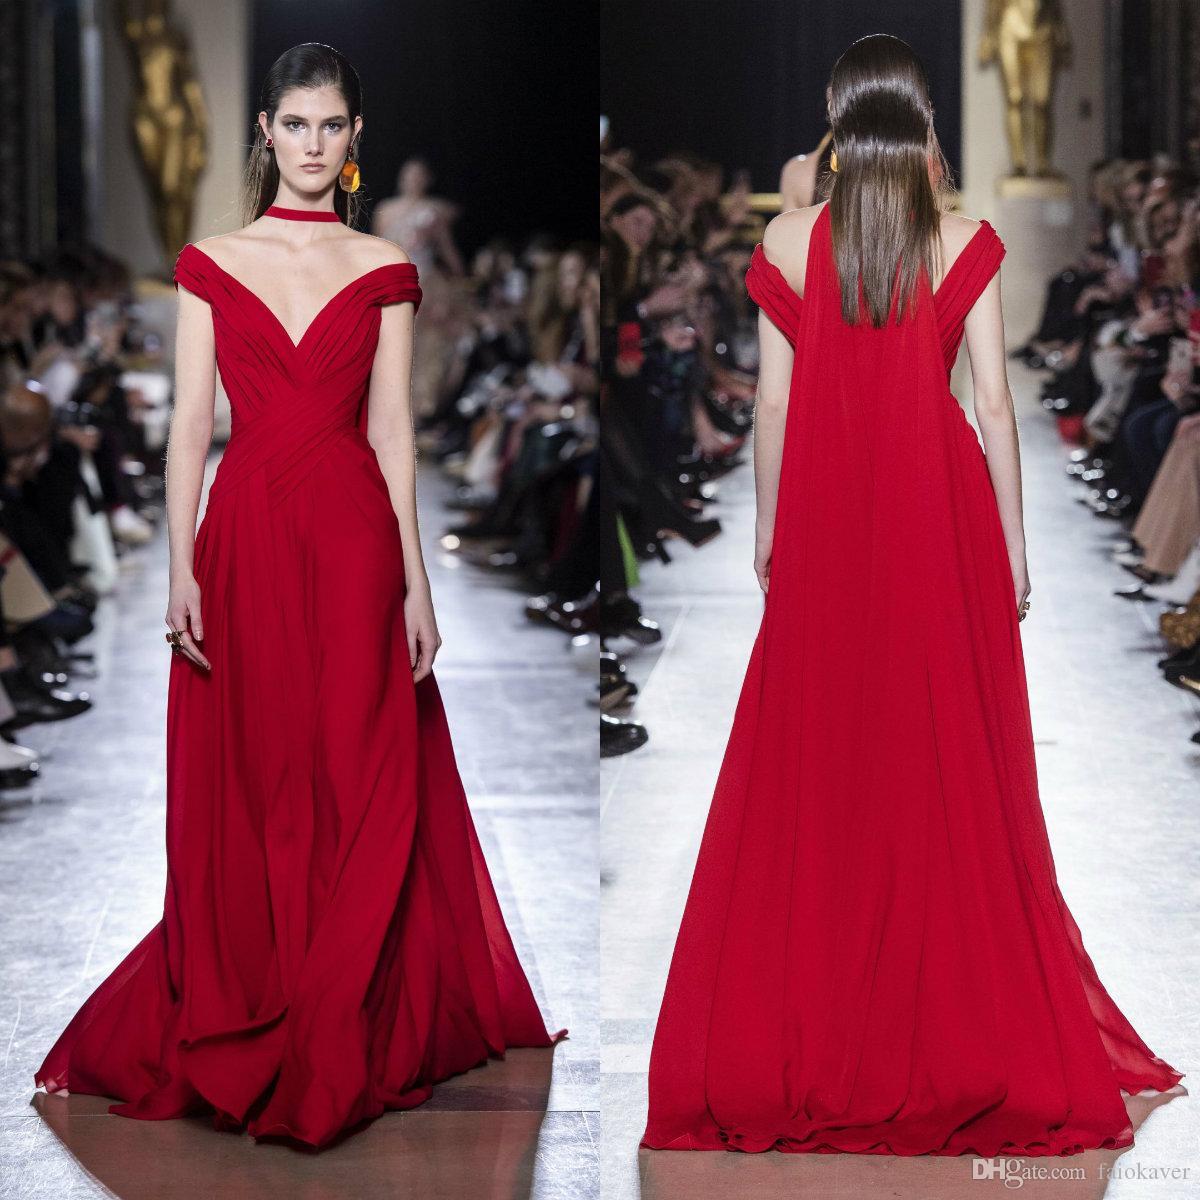 Elie Saab Evening Dresses Off The Shoulder A Line Ruffles Sweep Train Red Prom Dress 2020 Elegant Vestidos De Novia Sparkly Gowns